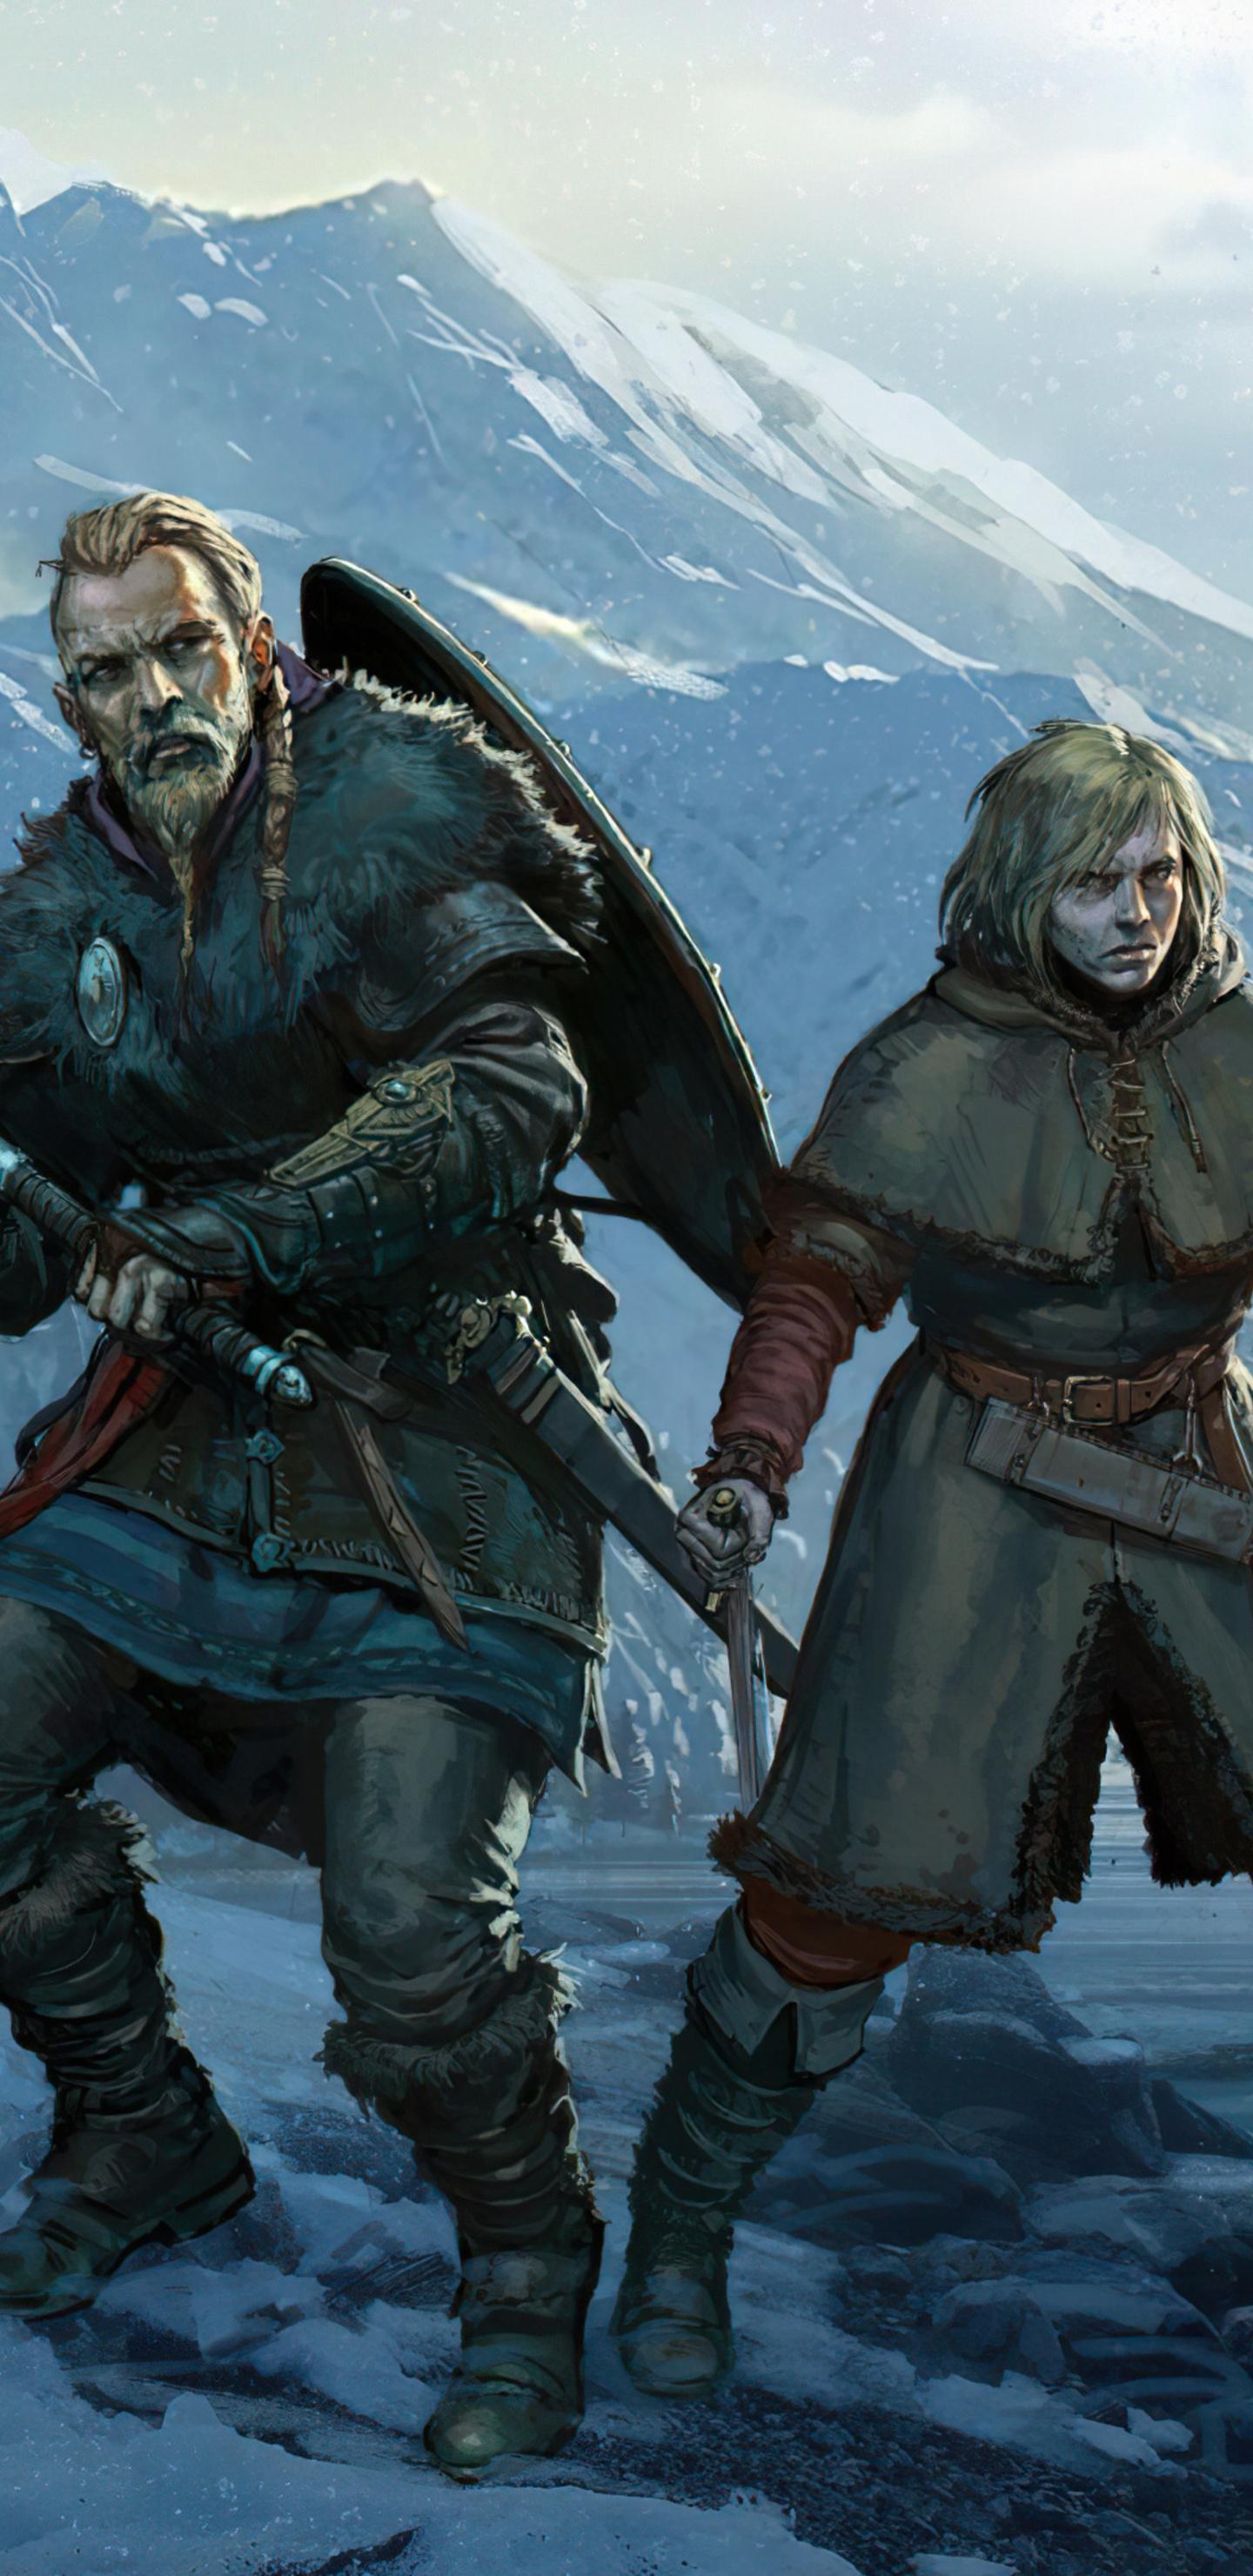 1440x2960 Vinland Saga Assassins Creed Valhalla 4k Samsung ...